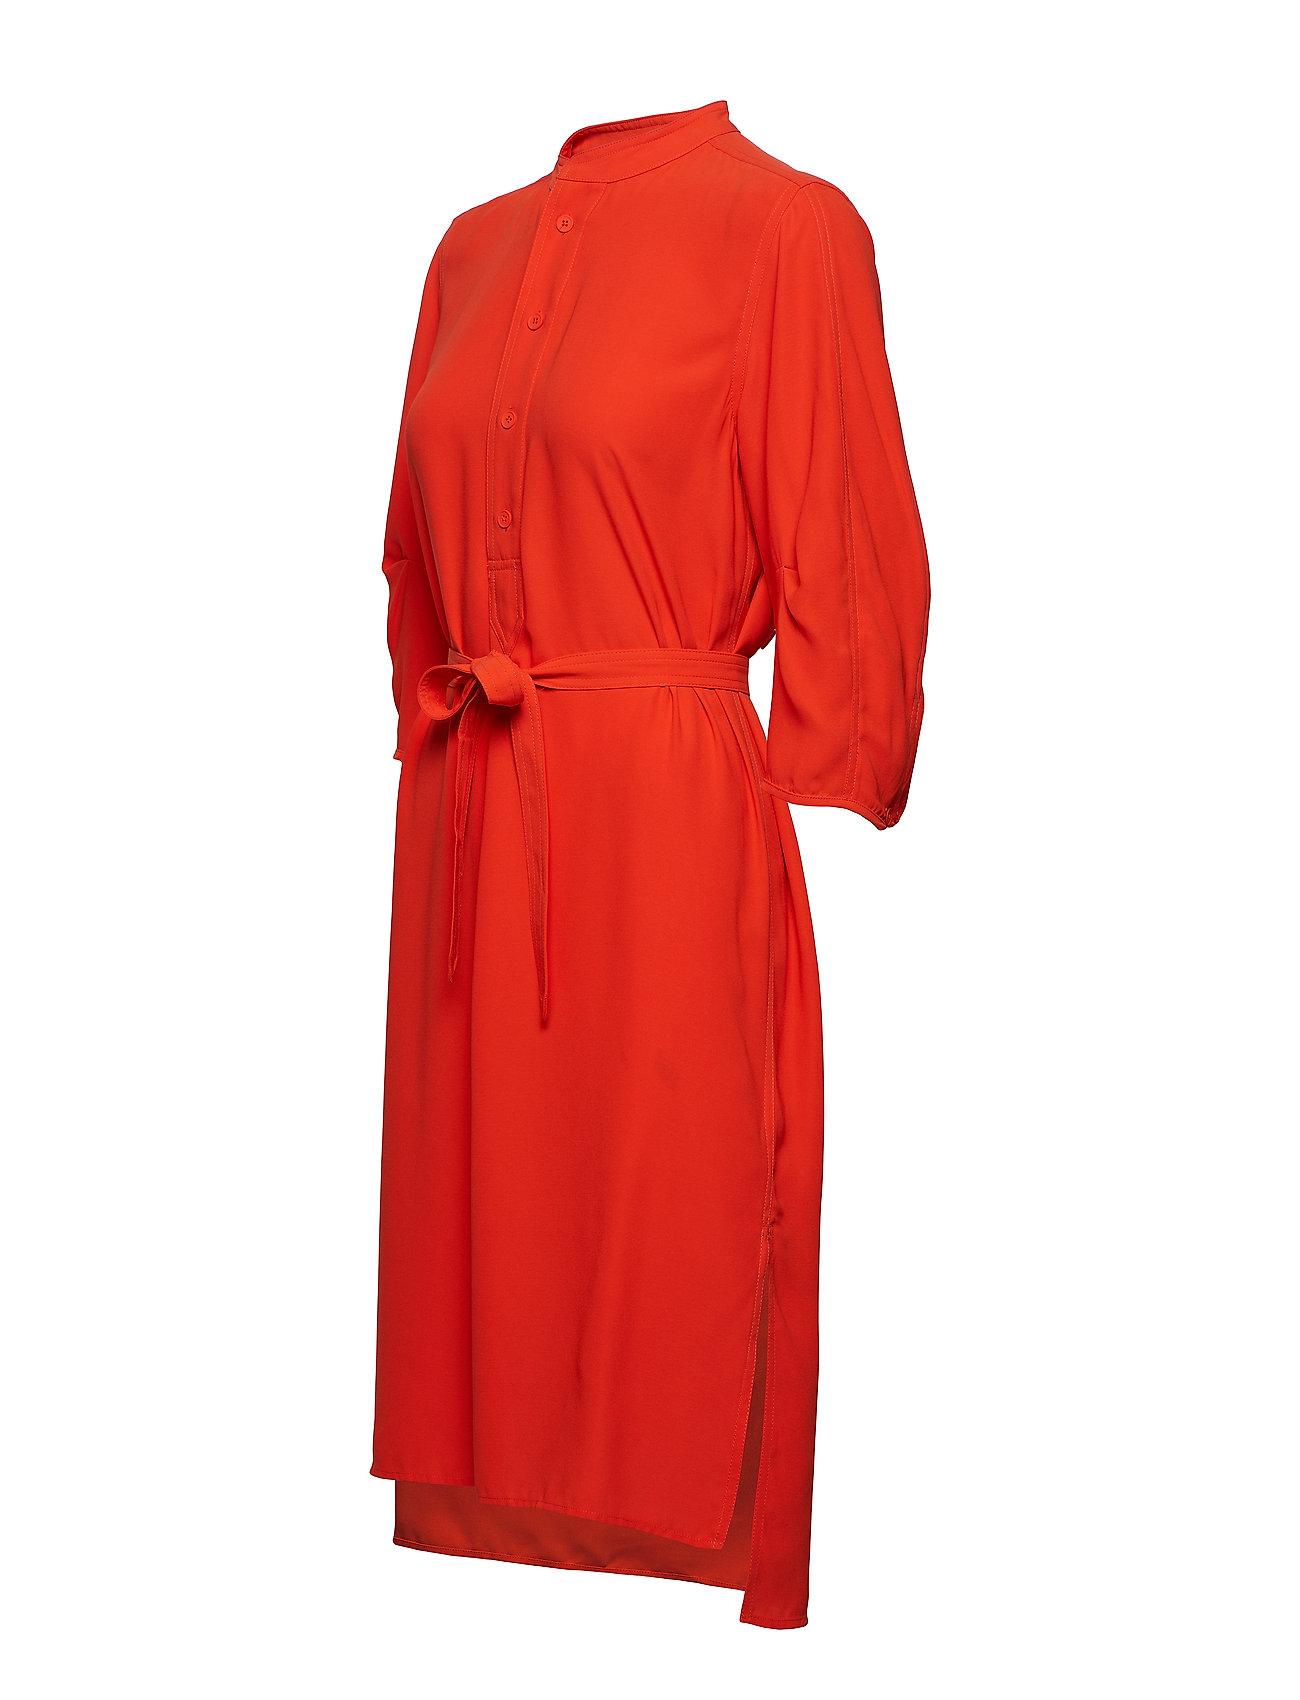 RedHope Dressbright Flex Flex Flex Dressbright RedHope tshrQdC